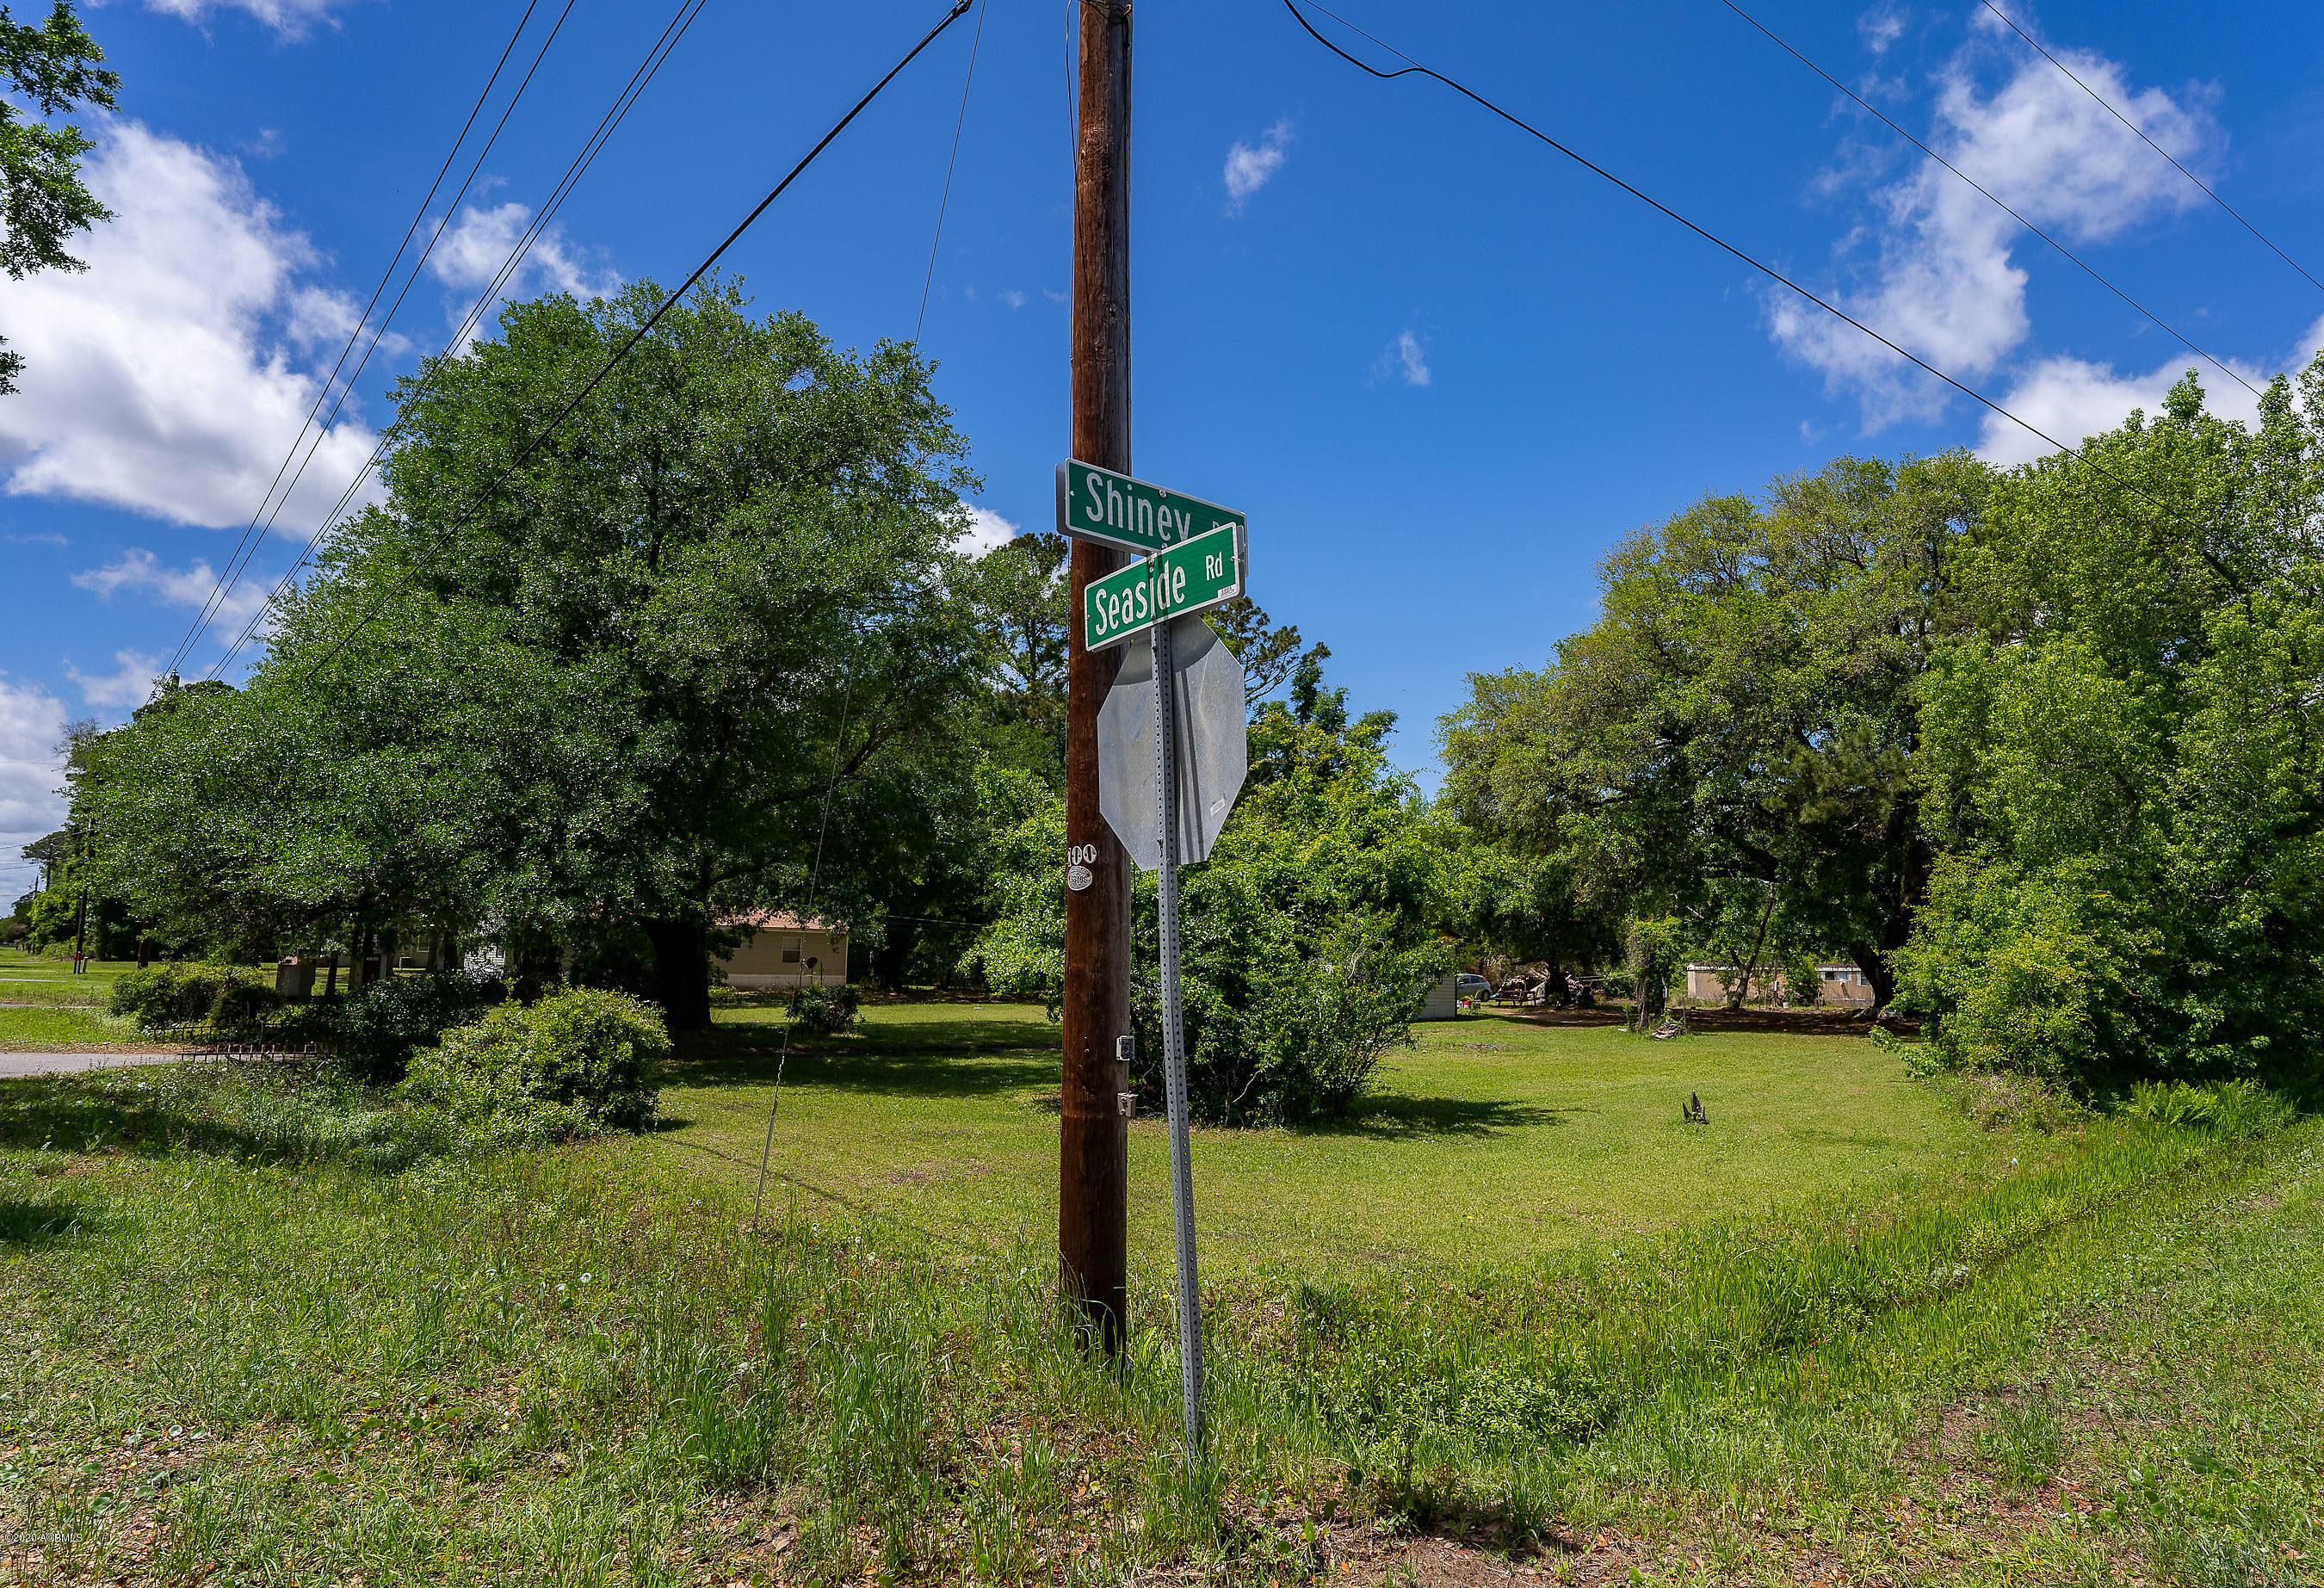 Photo of Tbd Shiney Road, St. Helena Island, SC 29920